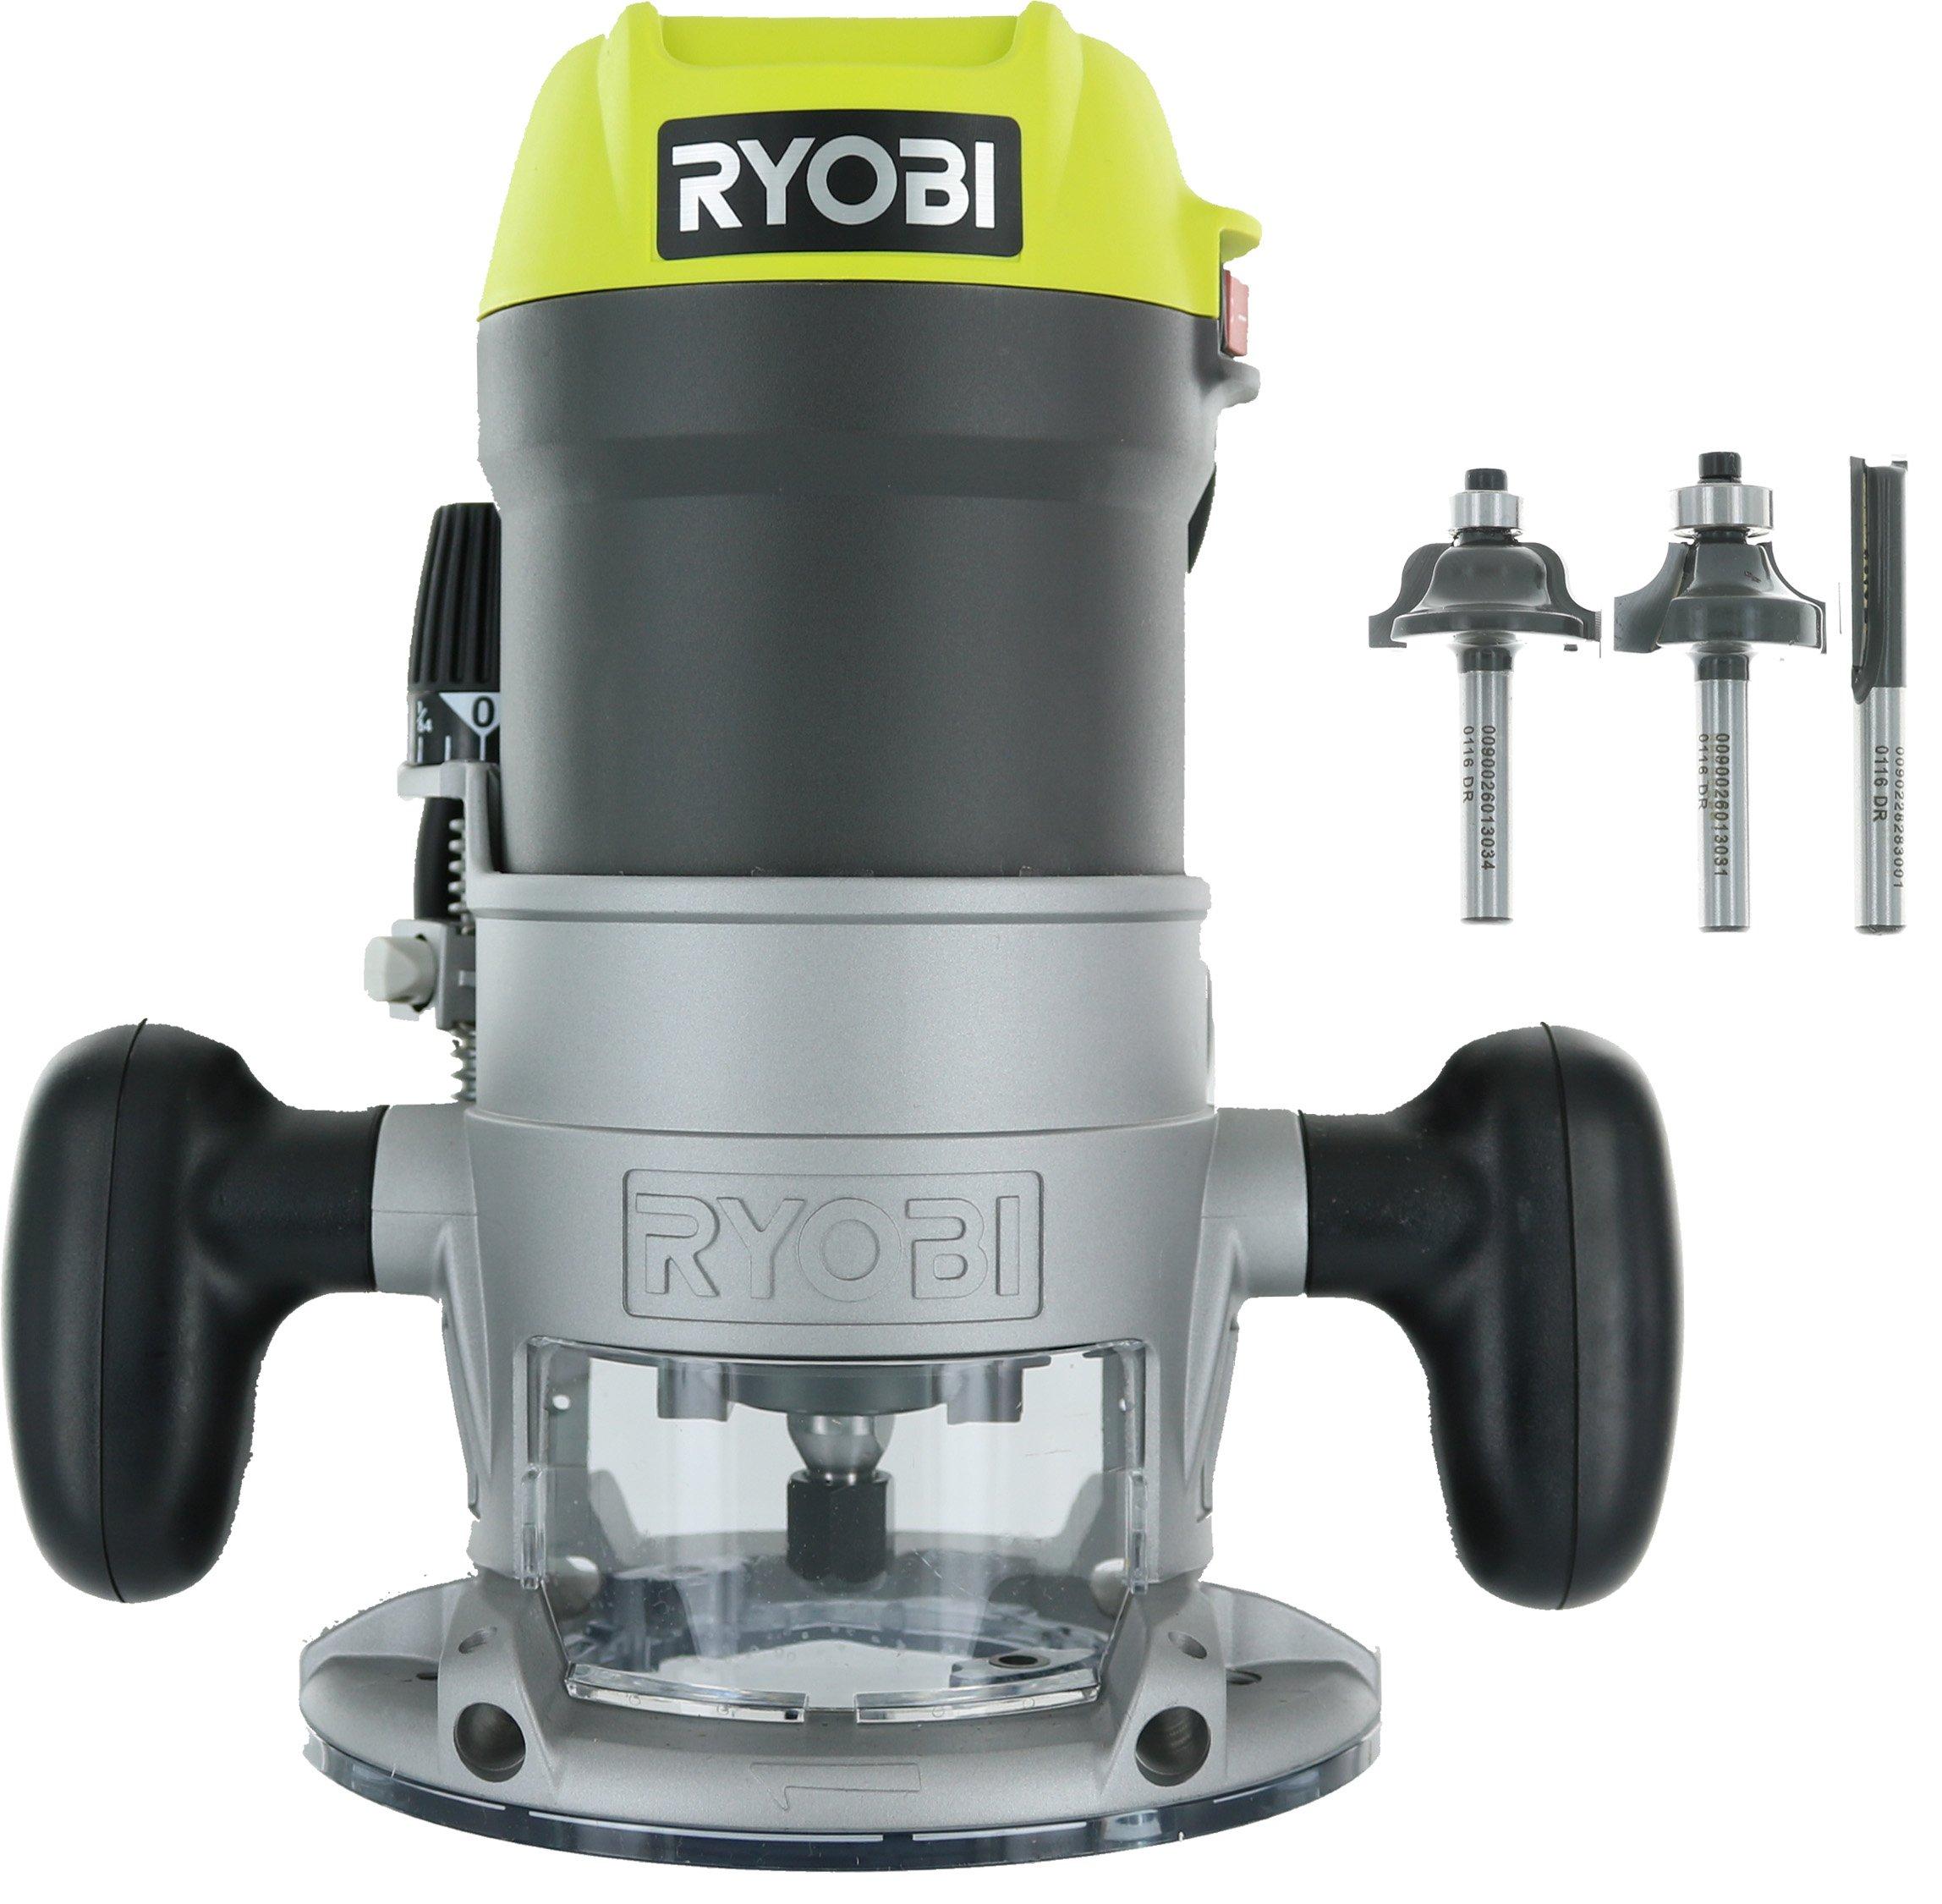 Ryobi R1631K 1-1/2 Peak HP 8.5 Amp LED Lit Corded Router Including 3 Piece Bit Set (w/ Tool Bag)